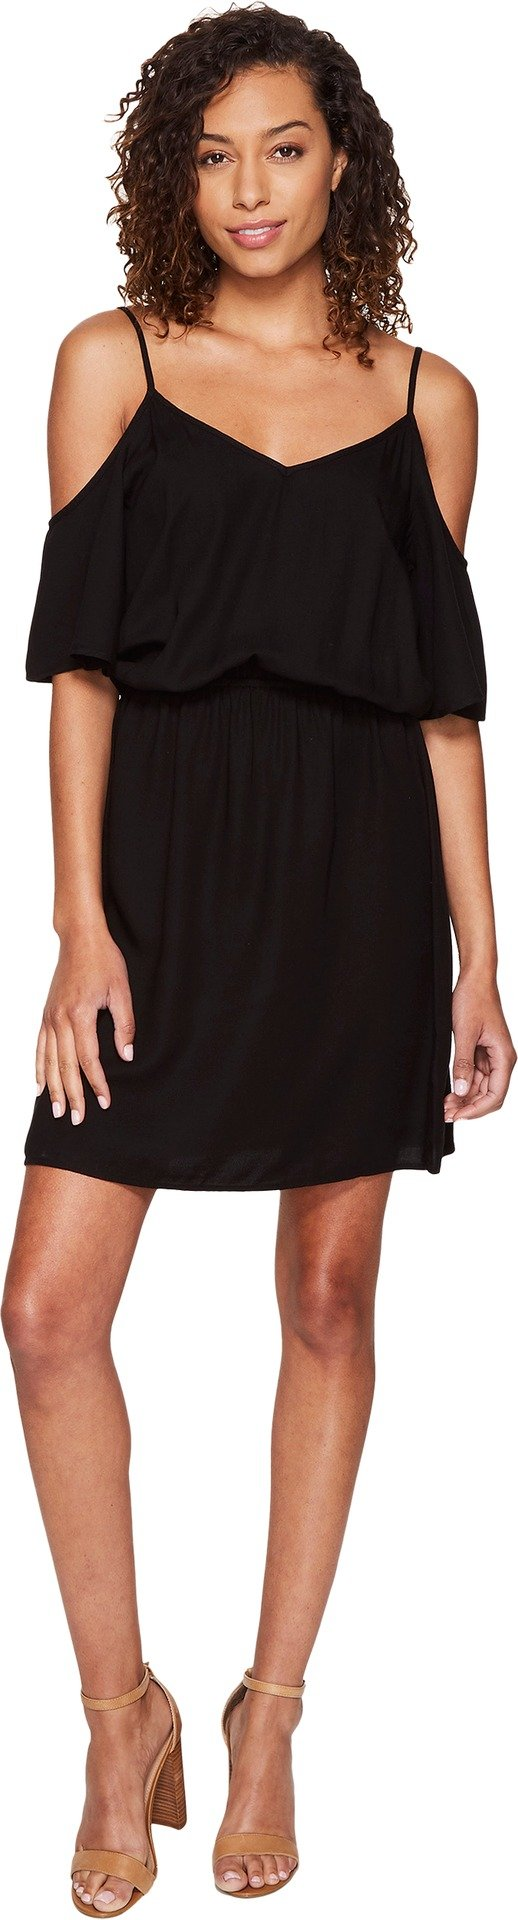 Splendid Women's Rayon Crosshatch Cold Shoulder Dress Black Dress